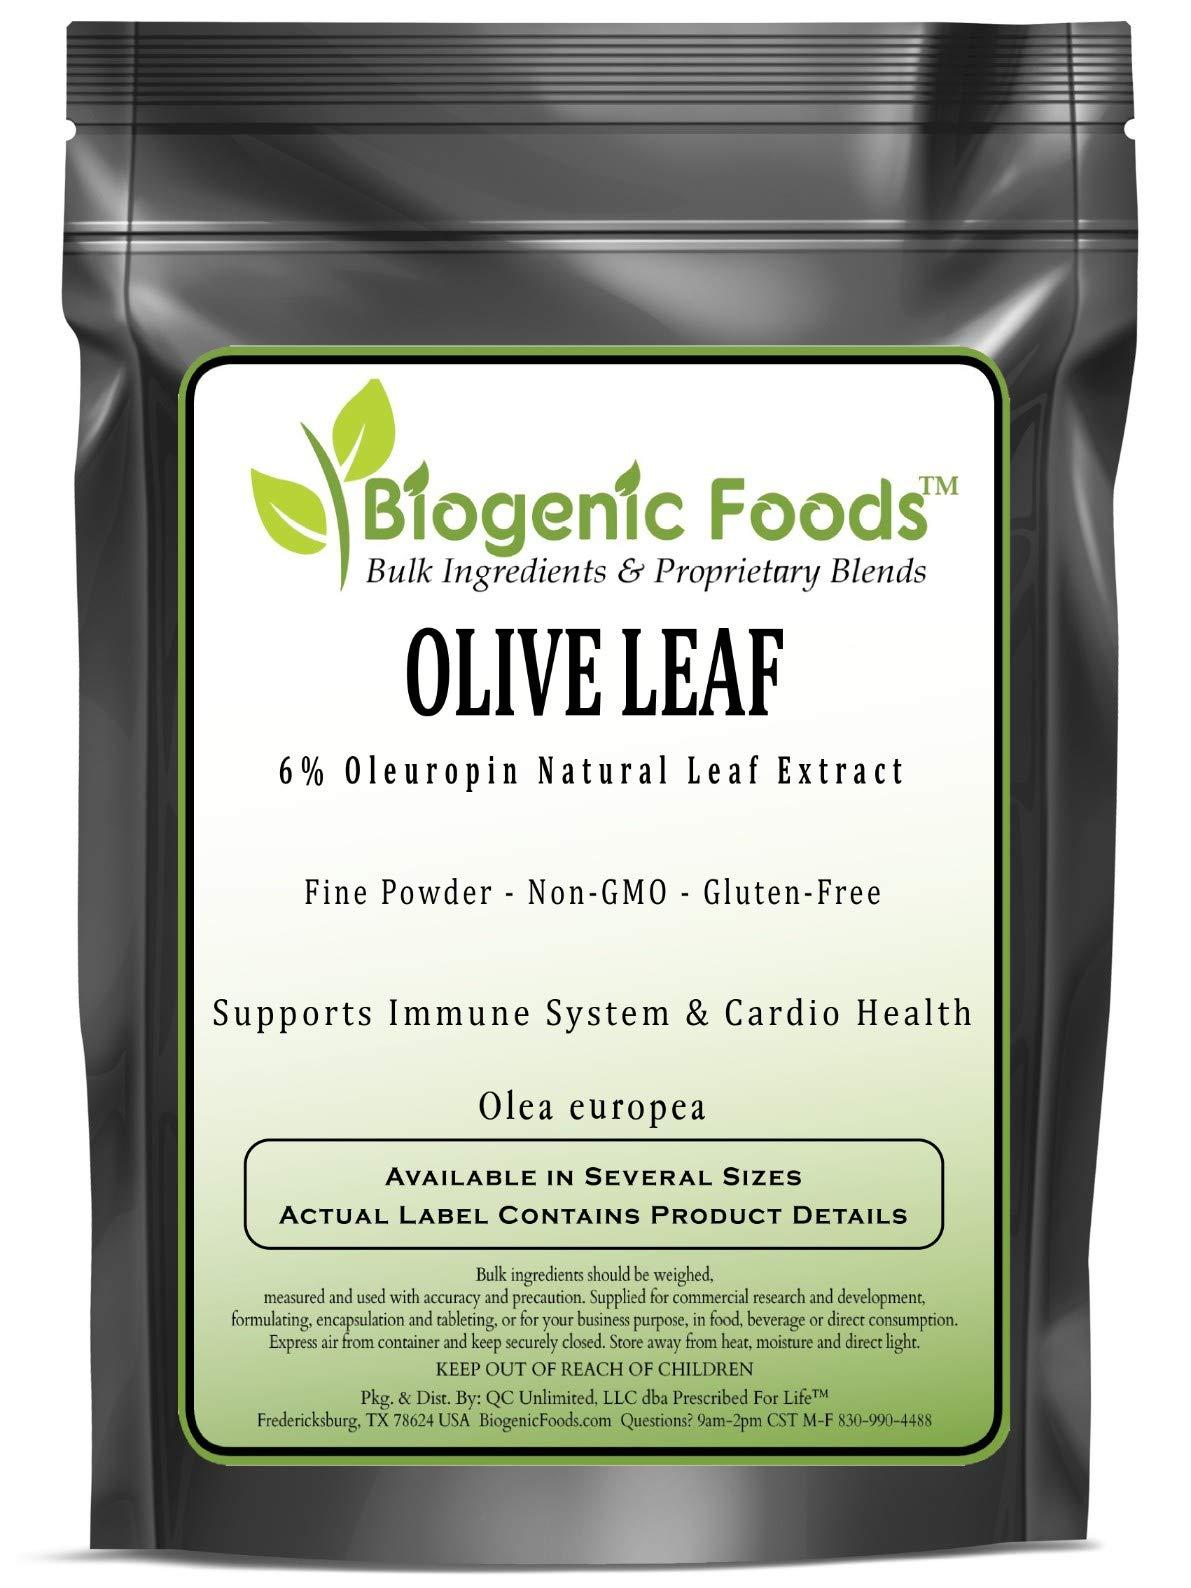 Olive Leaf - 6% Oleuropin Natural Leaf Fine Powder Extract (Olea Europea), 5 kg